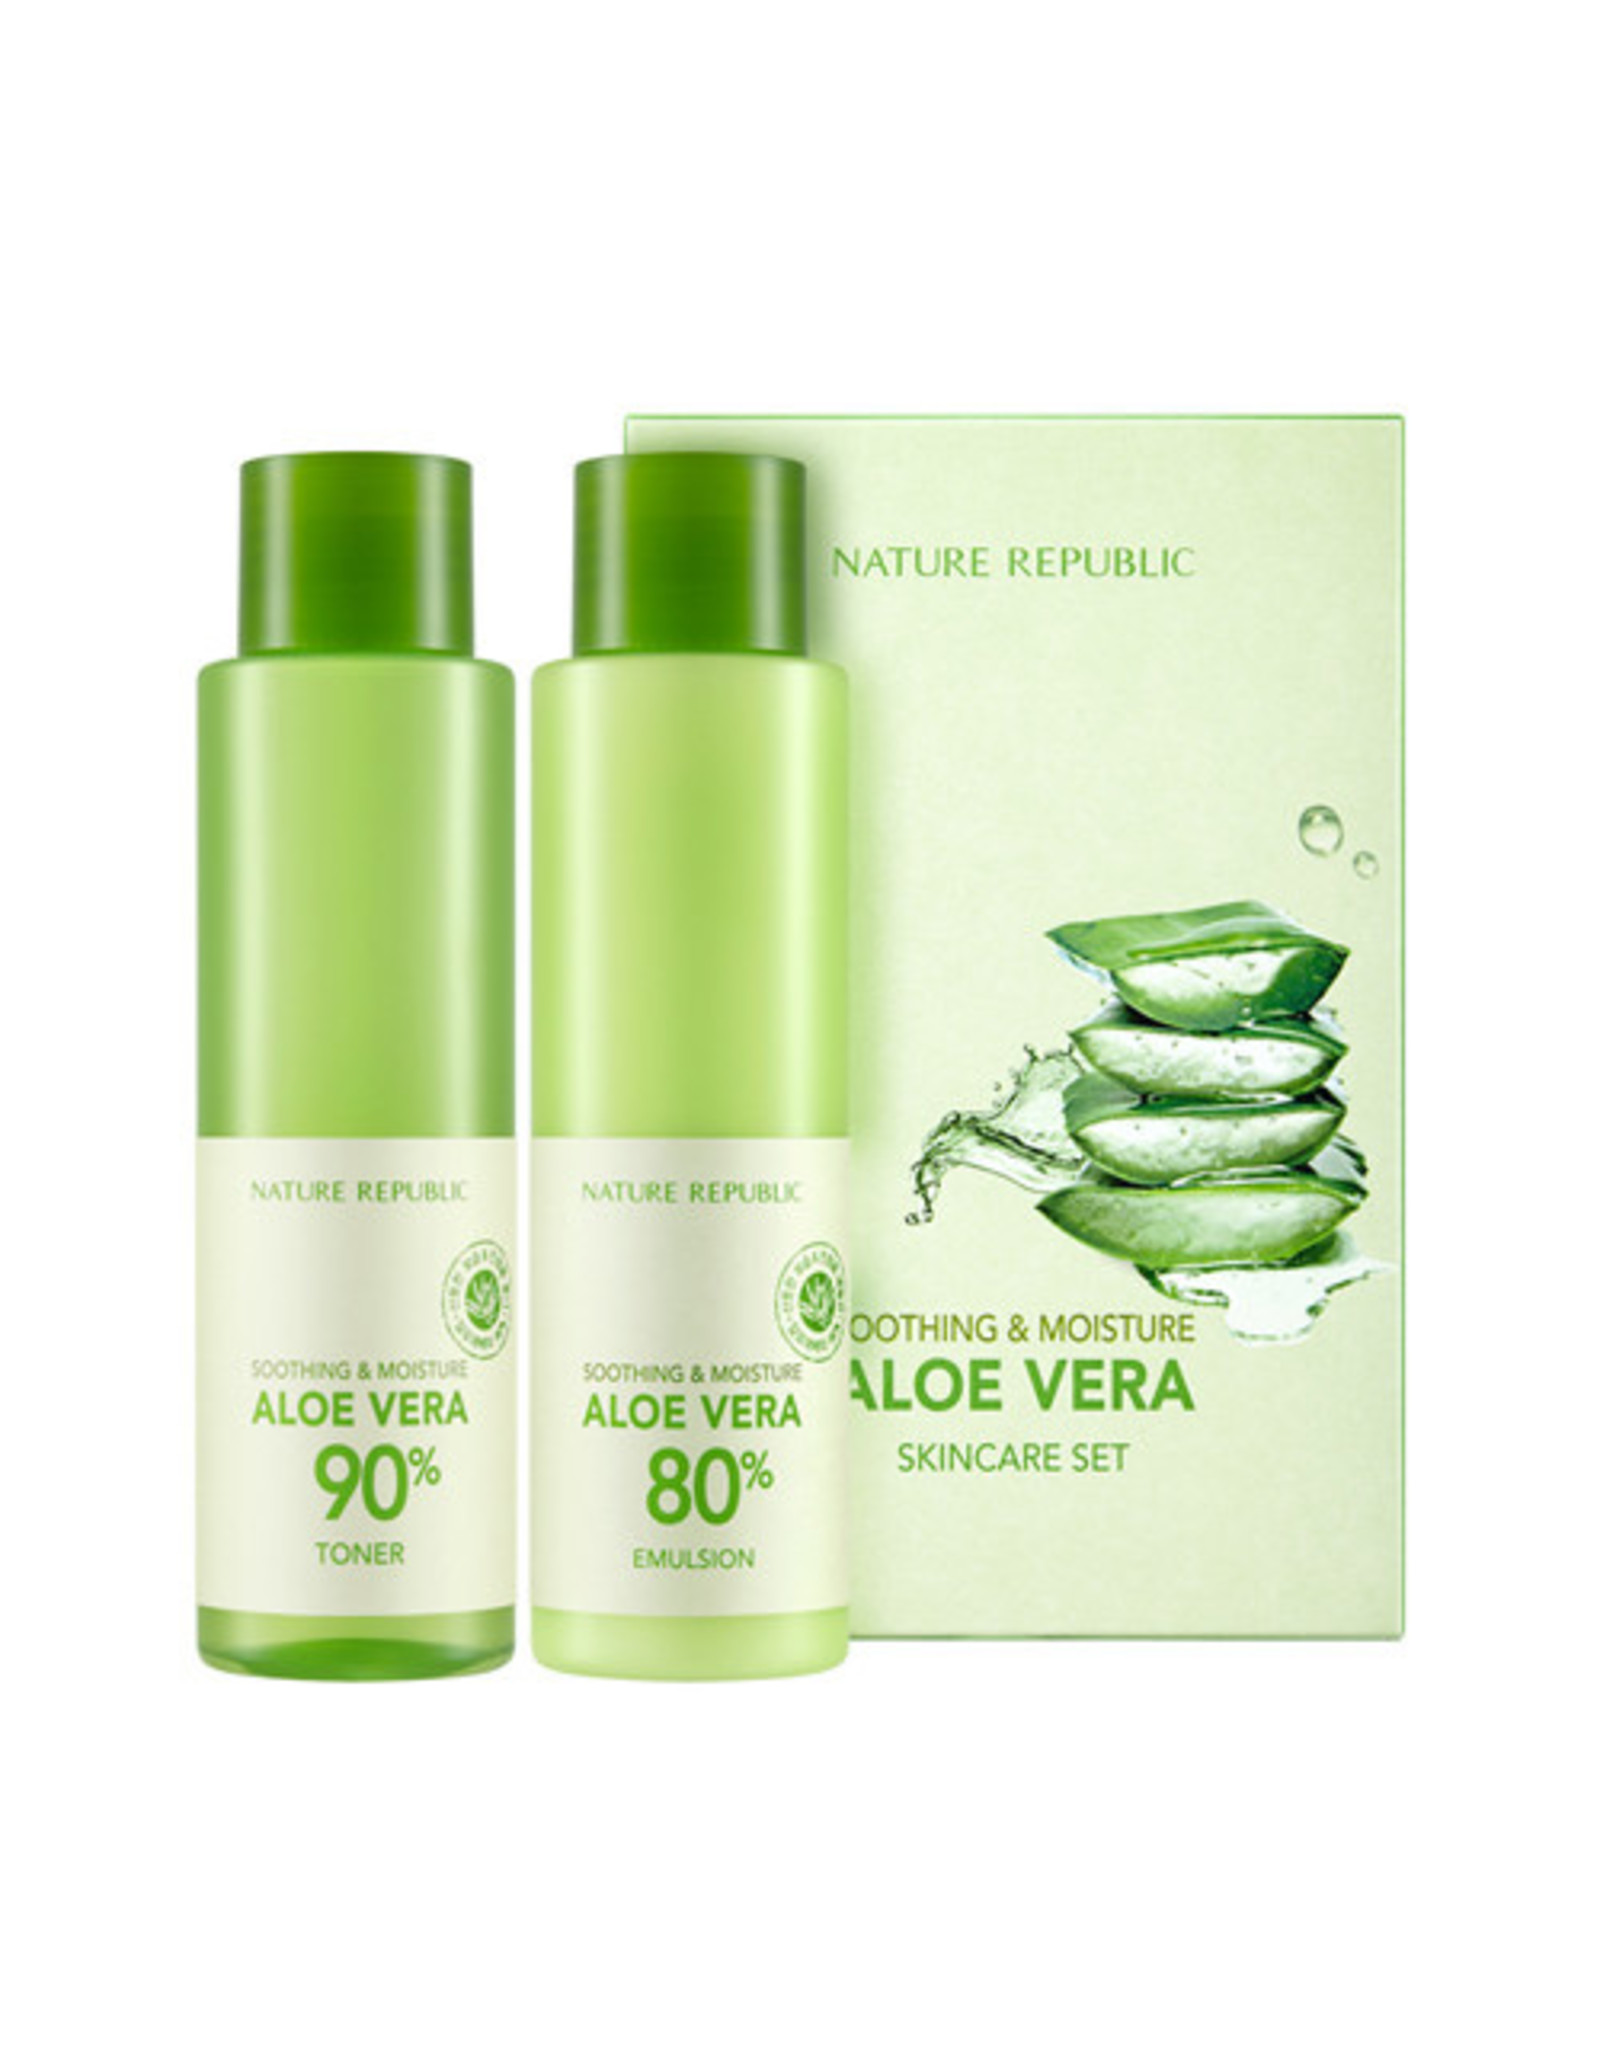 Soothing&Moisture Aloe Vera Skin Care Set (Orig $22.90)